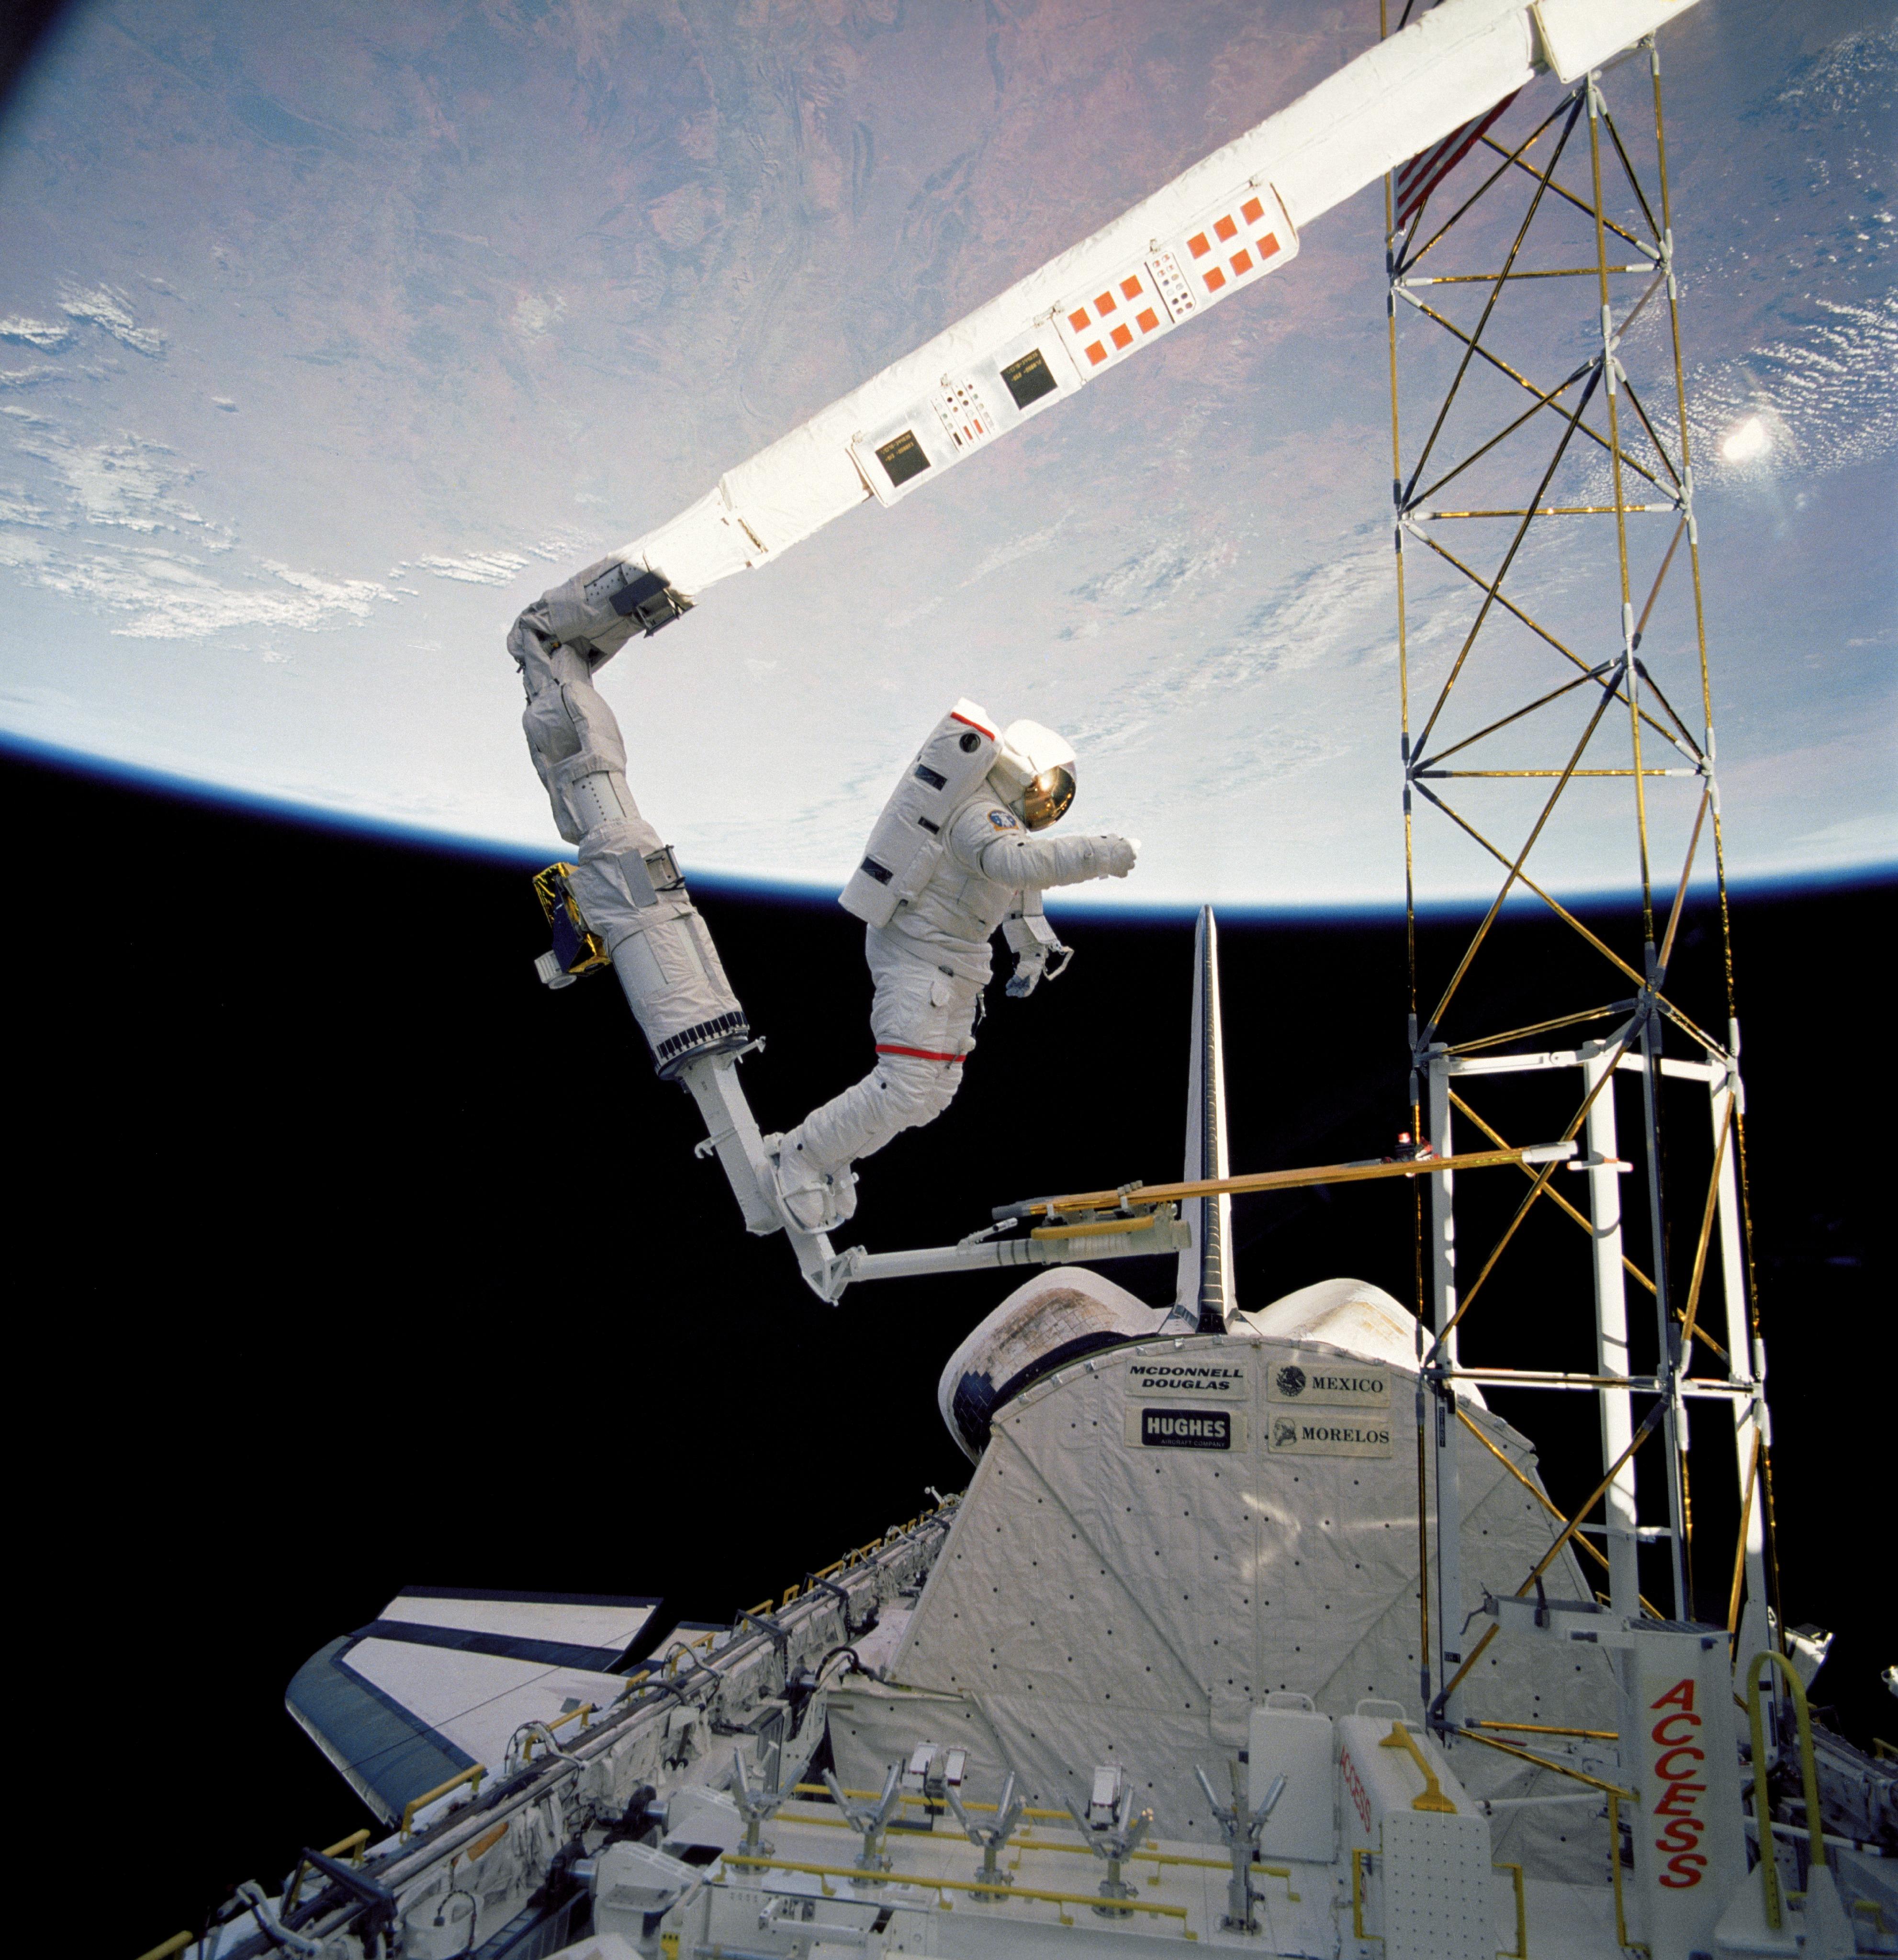 Nasa Space Shuttle Canadarm Robotic Arm Gallery